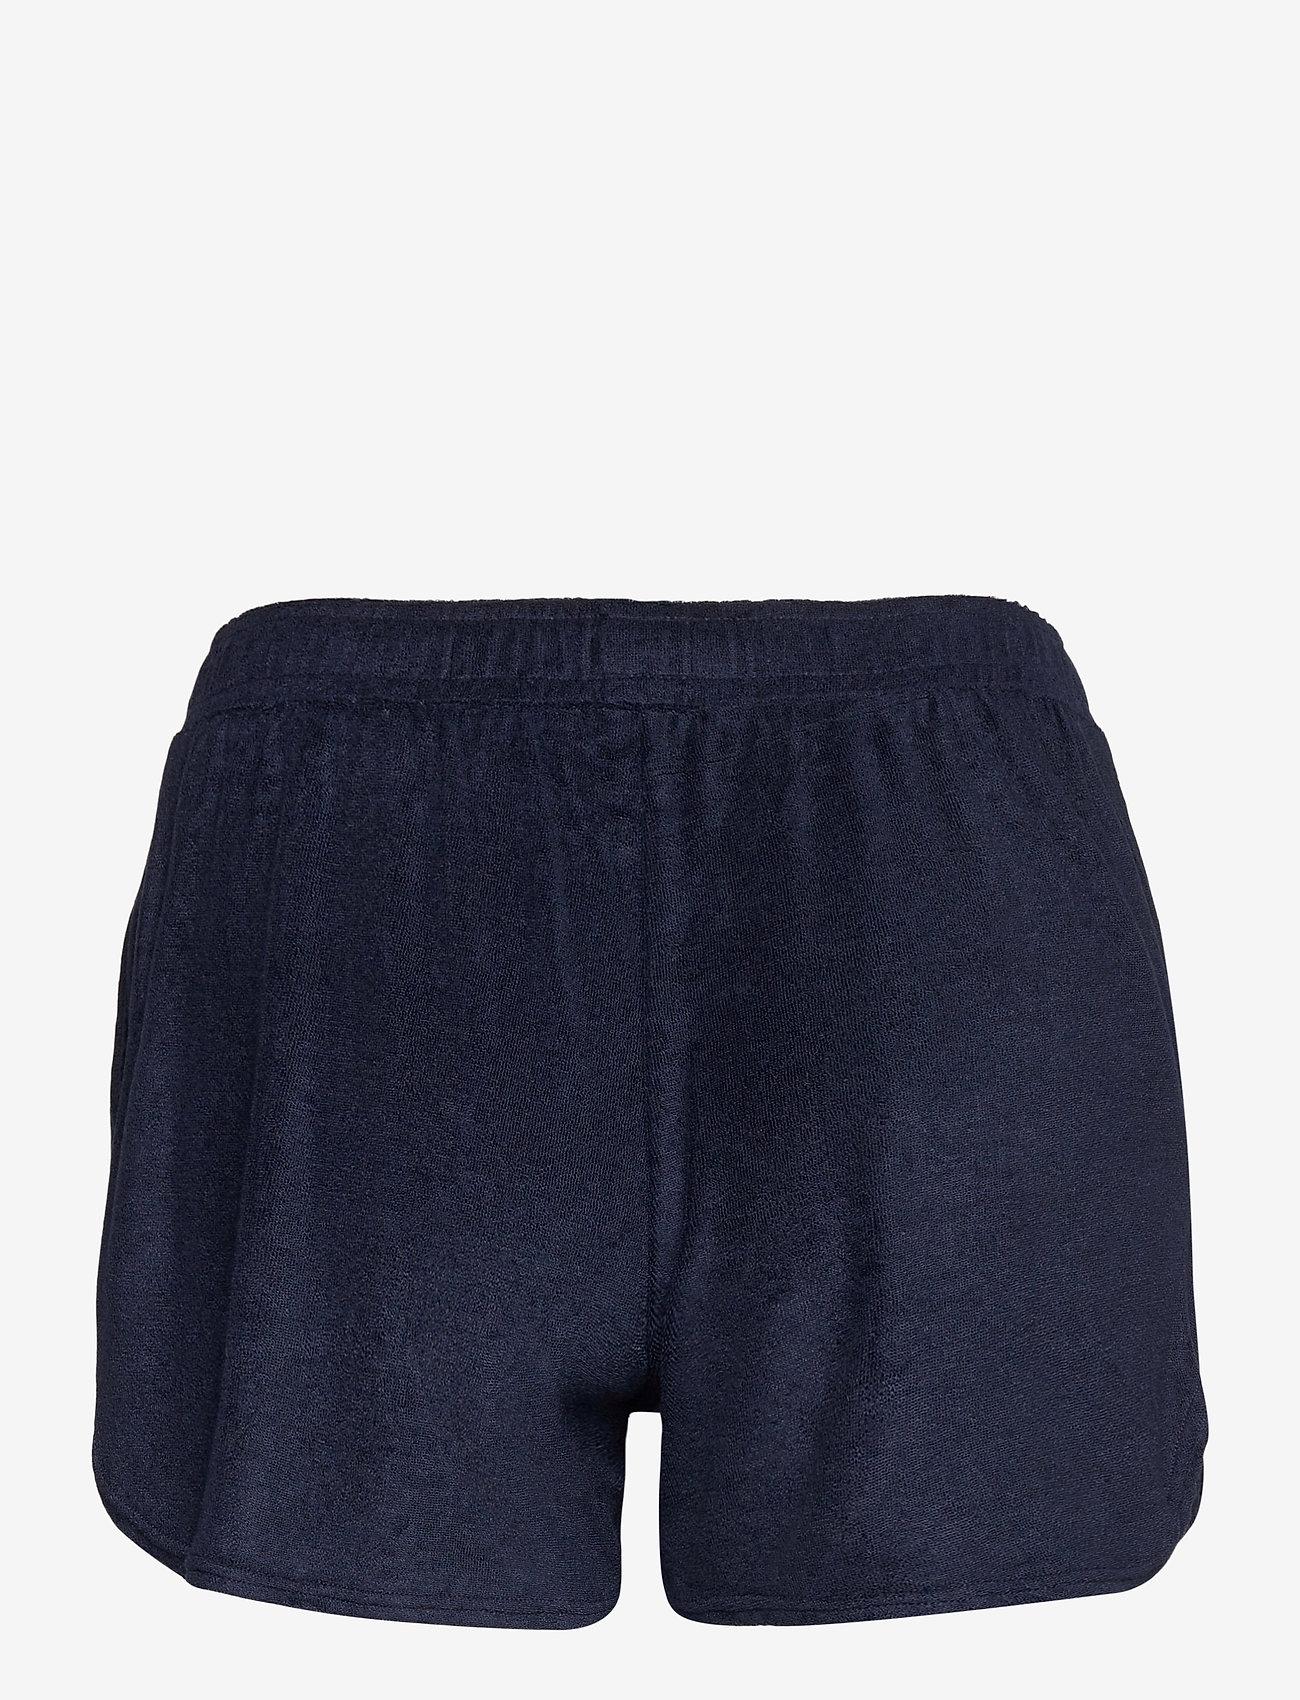 Schiesser - Shorts - shorts casual - nightblue - 1